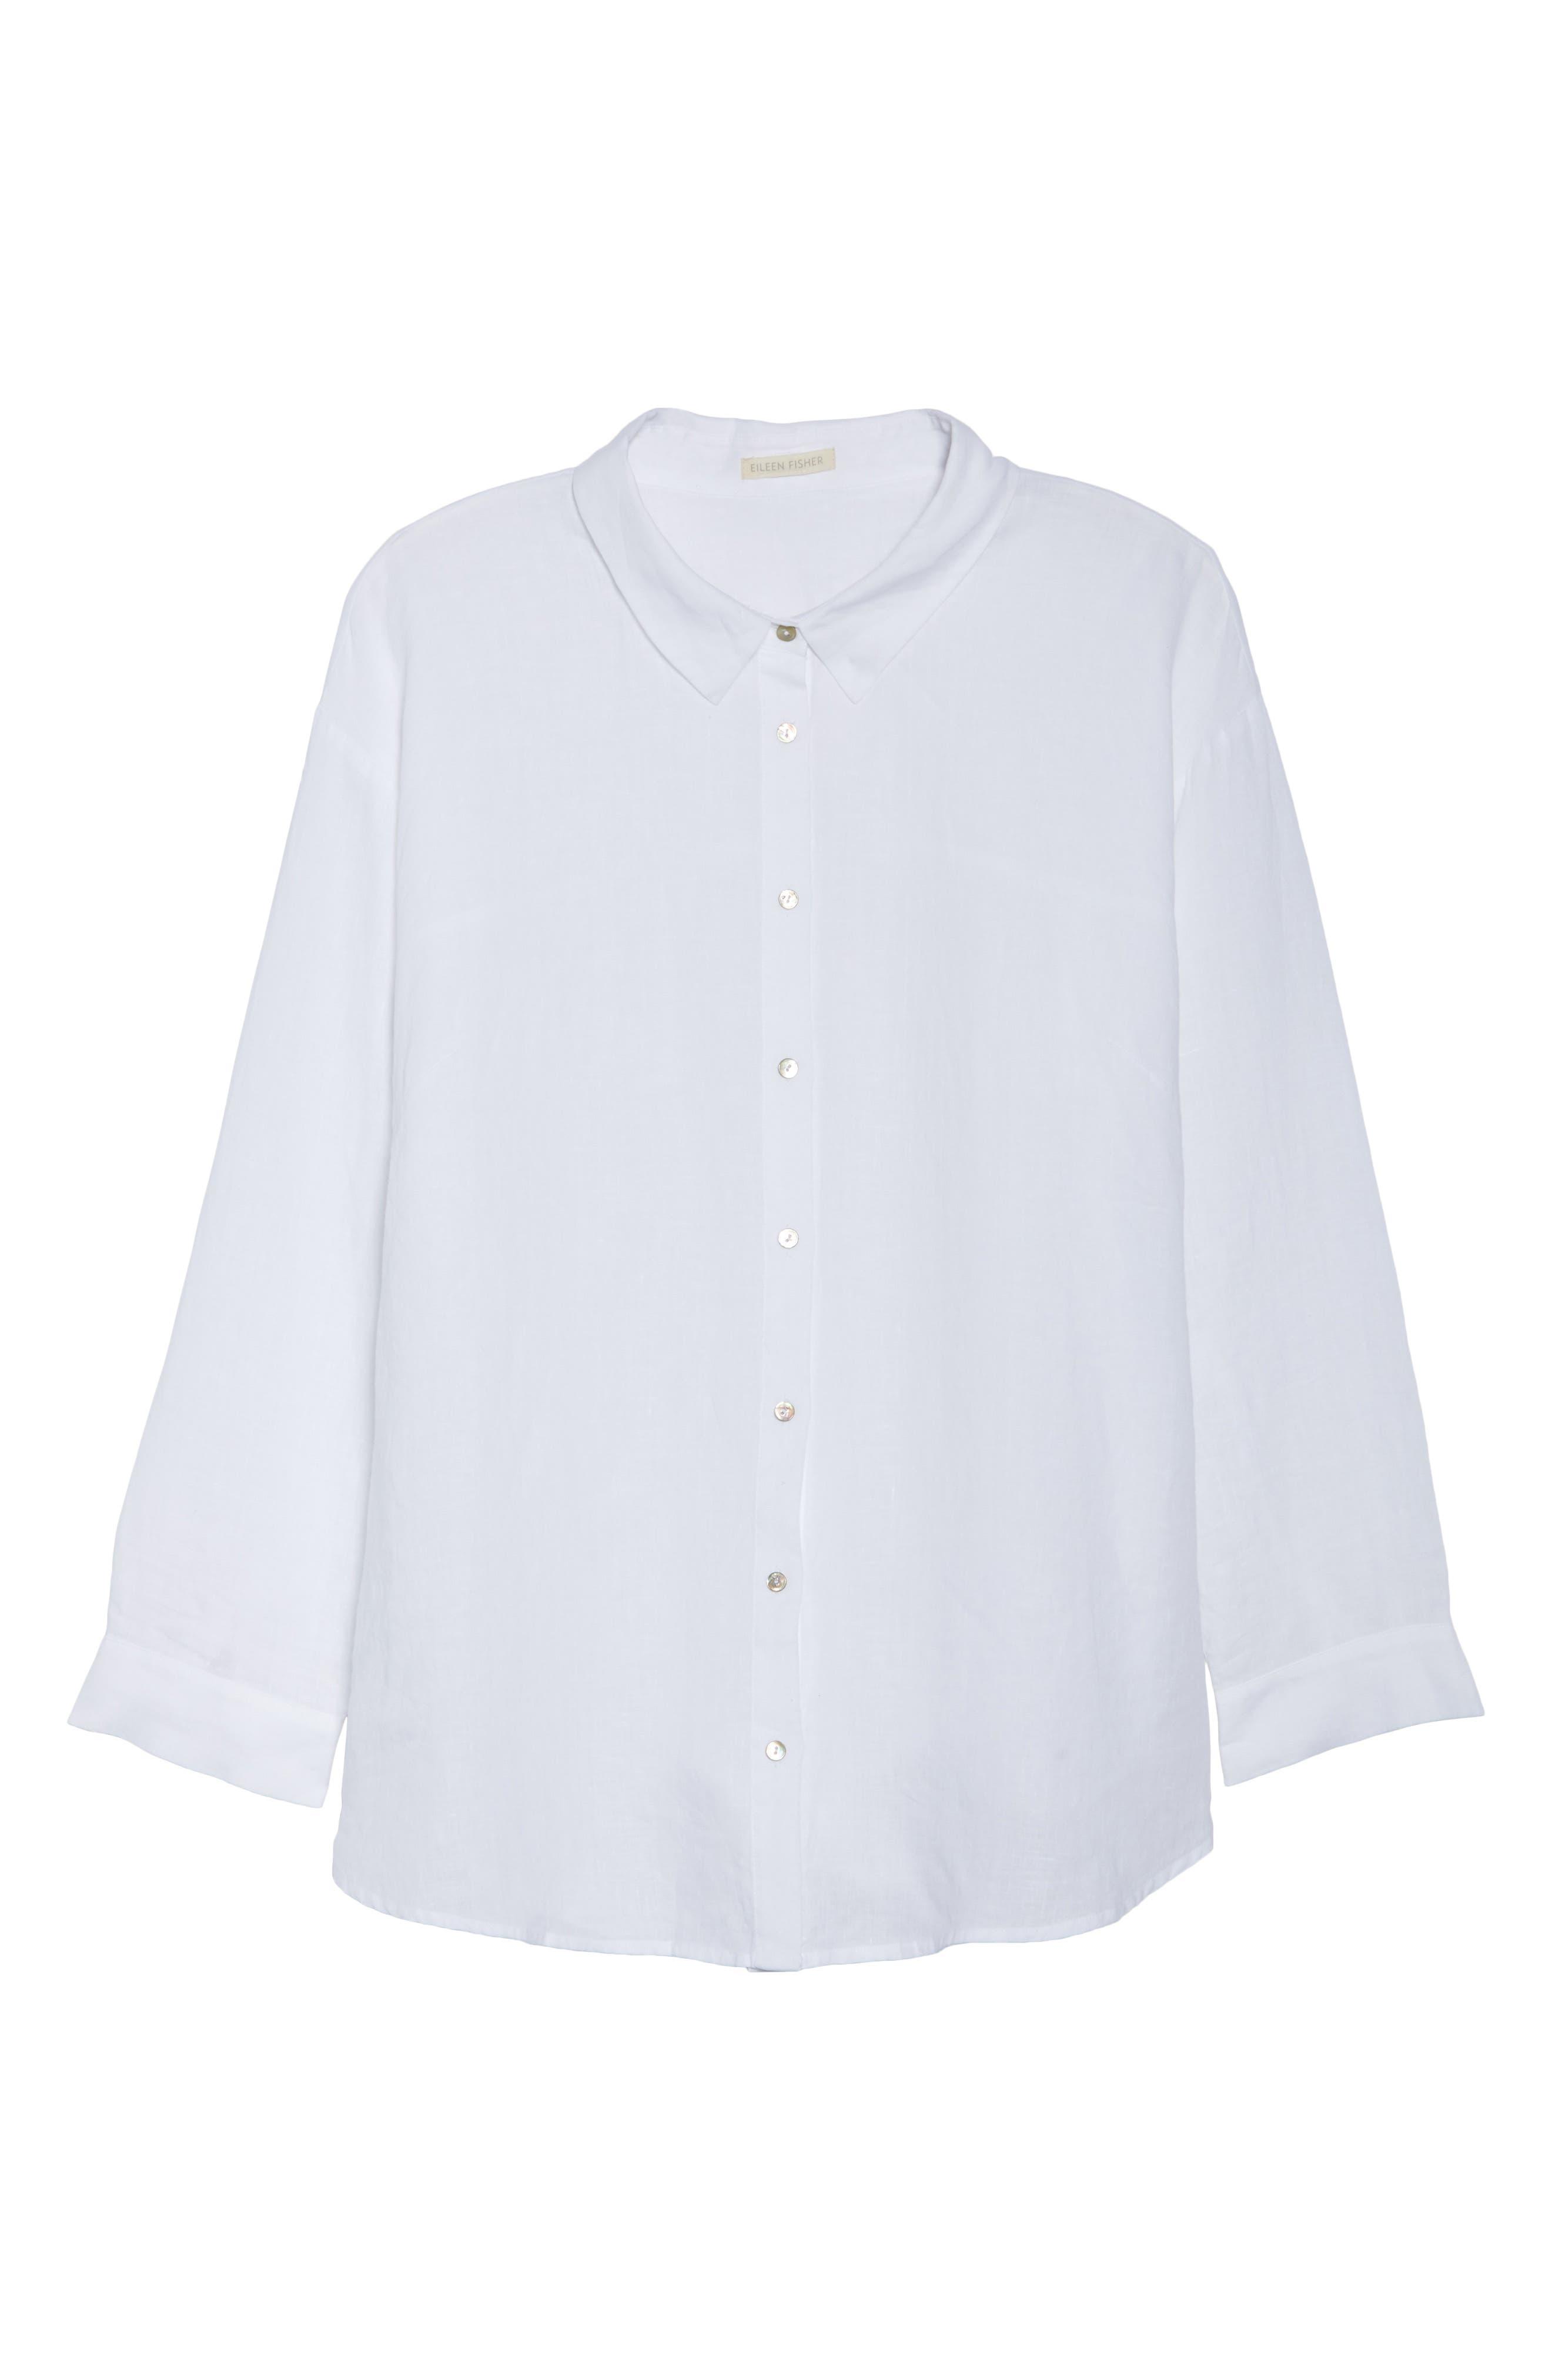 Organic Linen Shirt,                             Alternate thumbnail 7, color,                             100